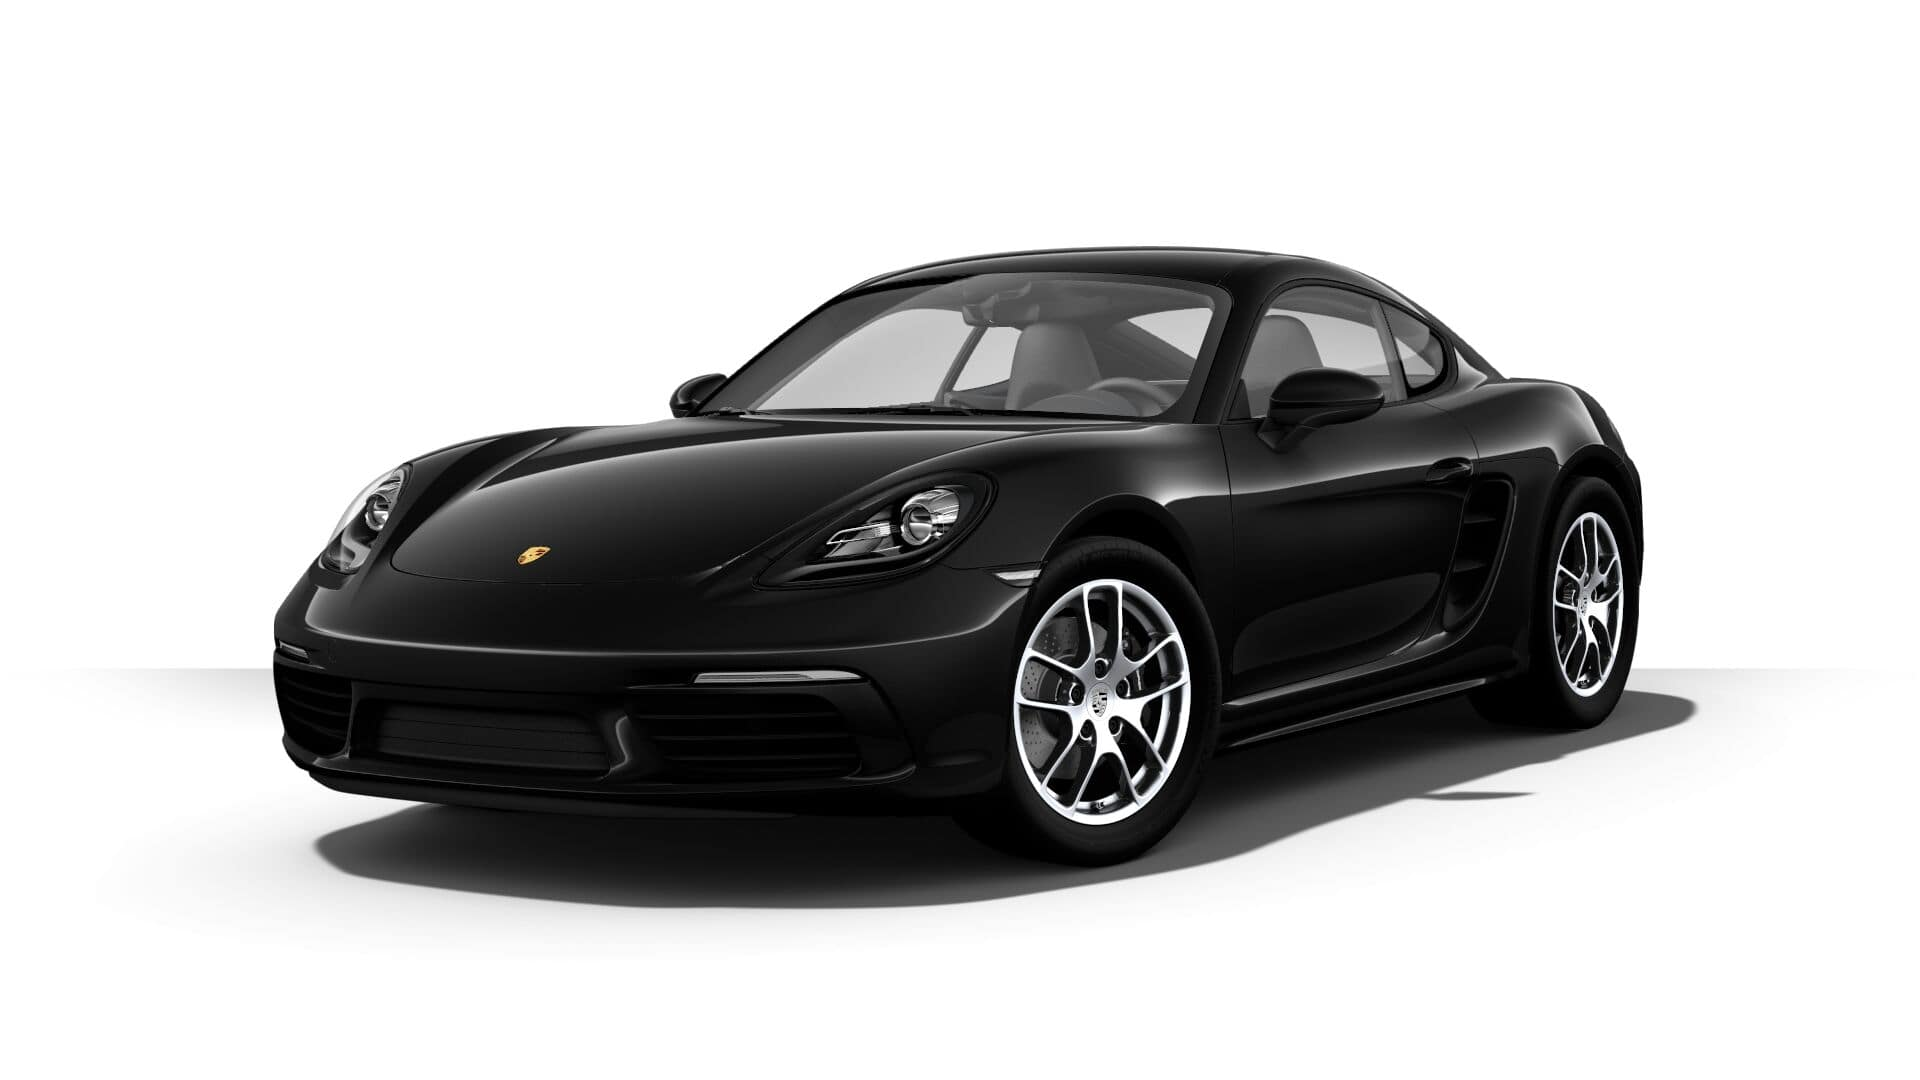 New 2020 Porsche 718 | Porsche